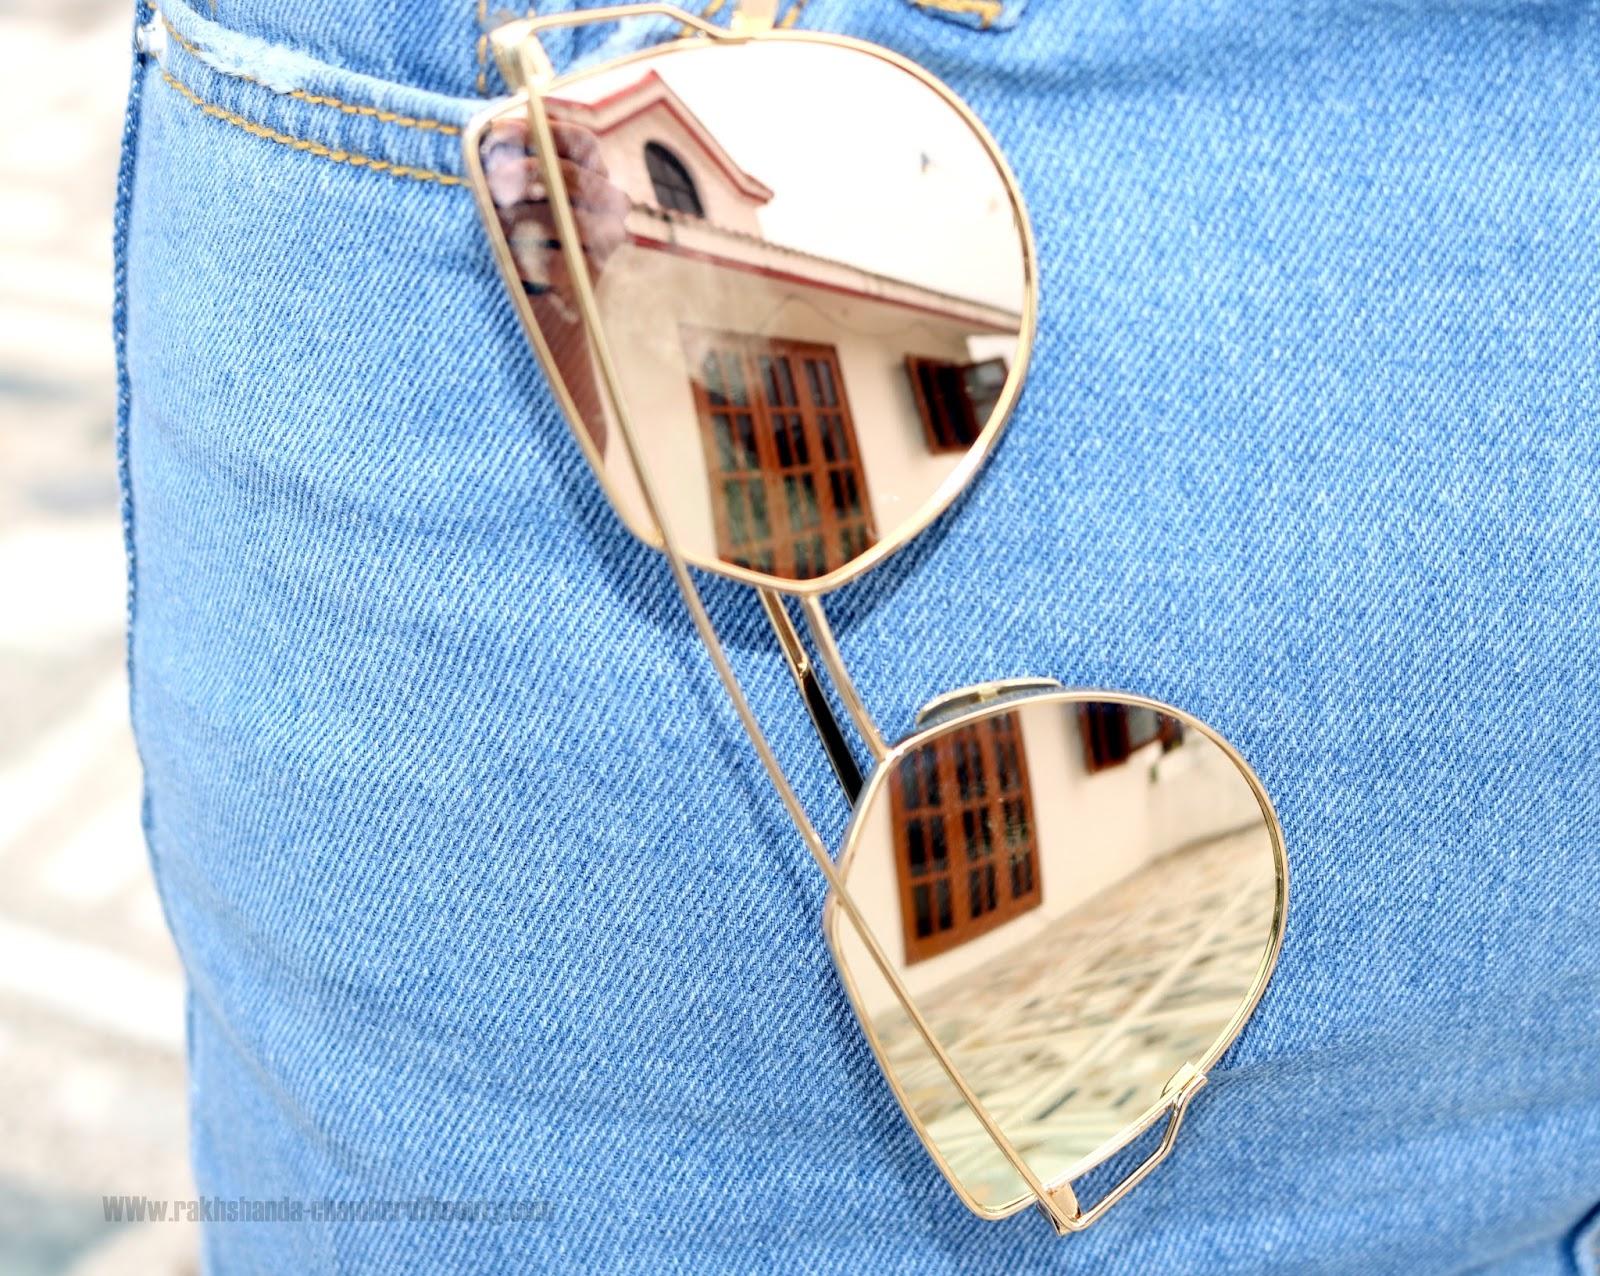 Blue Shirt + Denim Skirt Fall Fashion Trendsautumn outfit, Blue Embroidered collar shirt, fall fashion, fashion,Mirror sunglasses, Indian fashion blogger